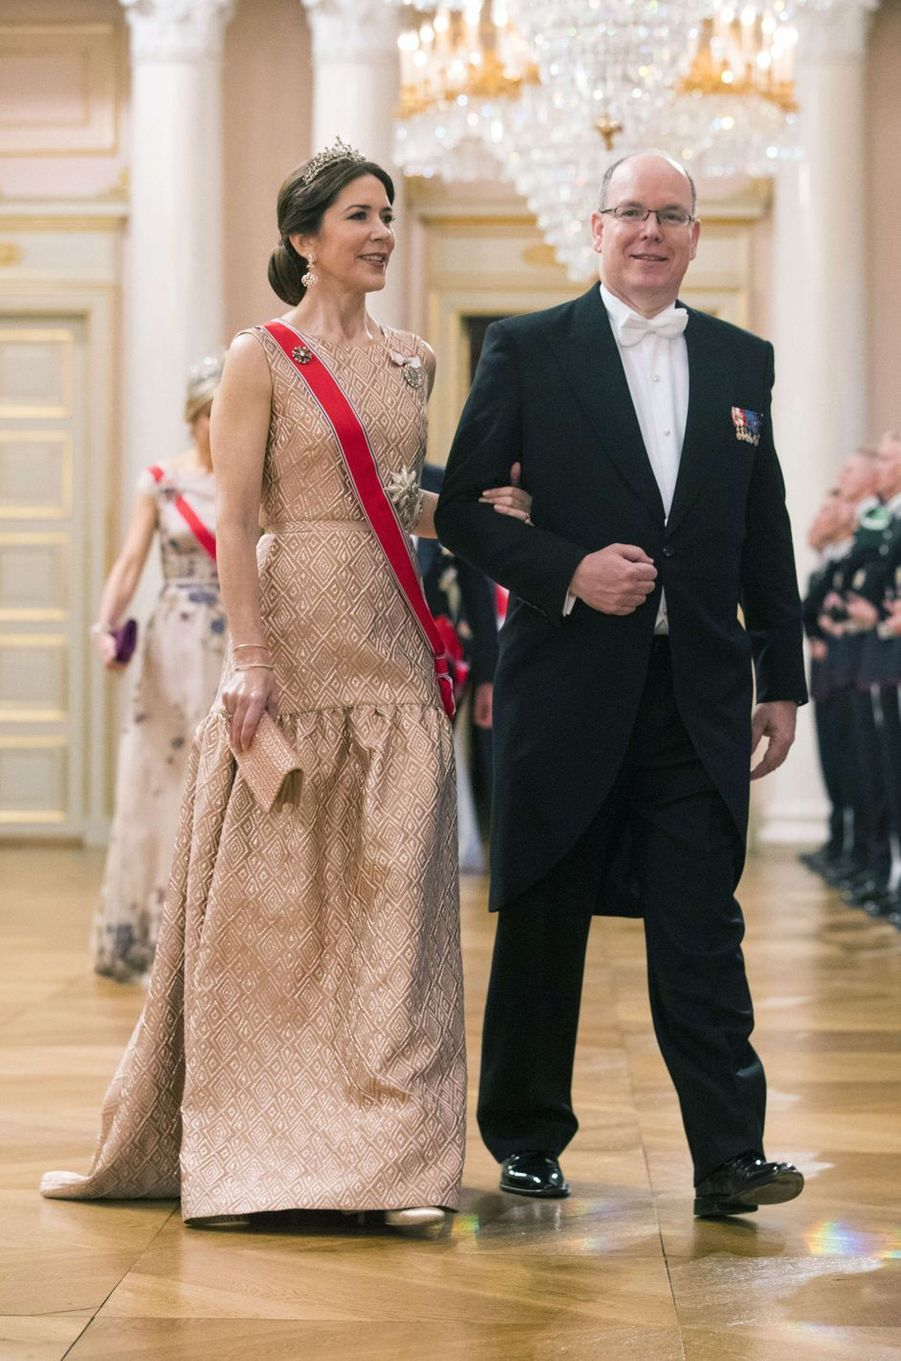 La princesse Mary de Danemark avec le prince Albert II de Monaco à Oslo, le 9 mai 2017